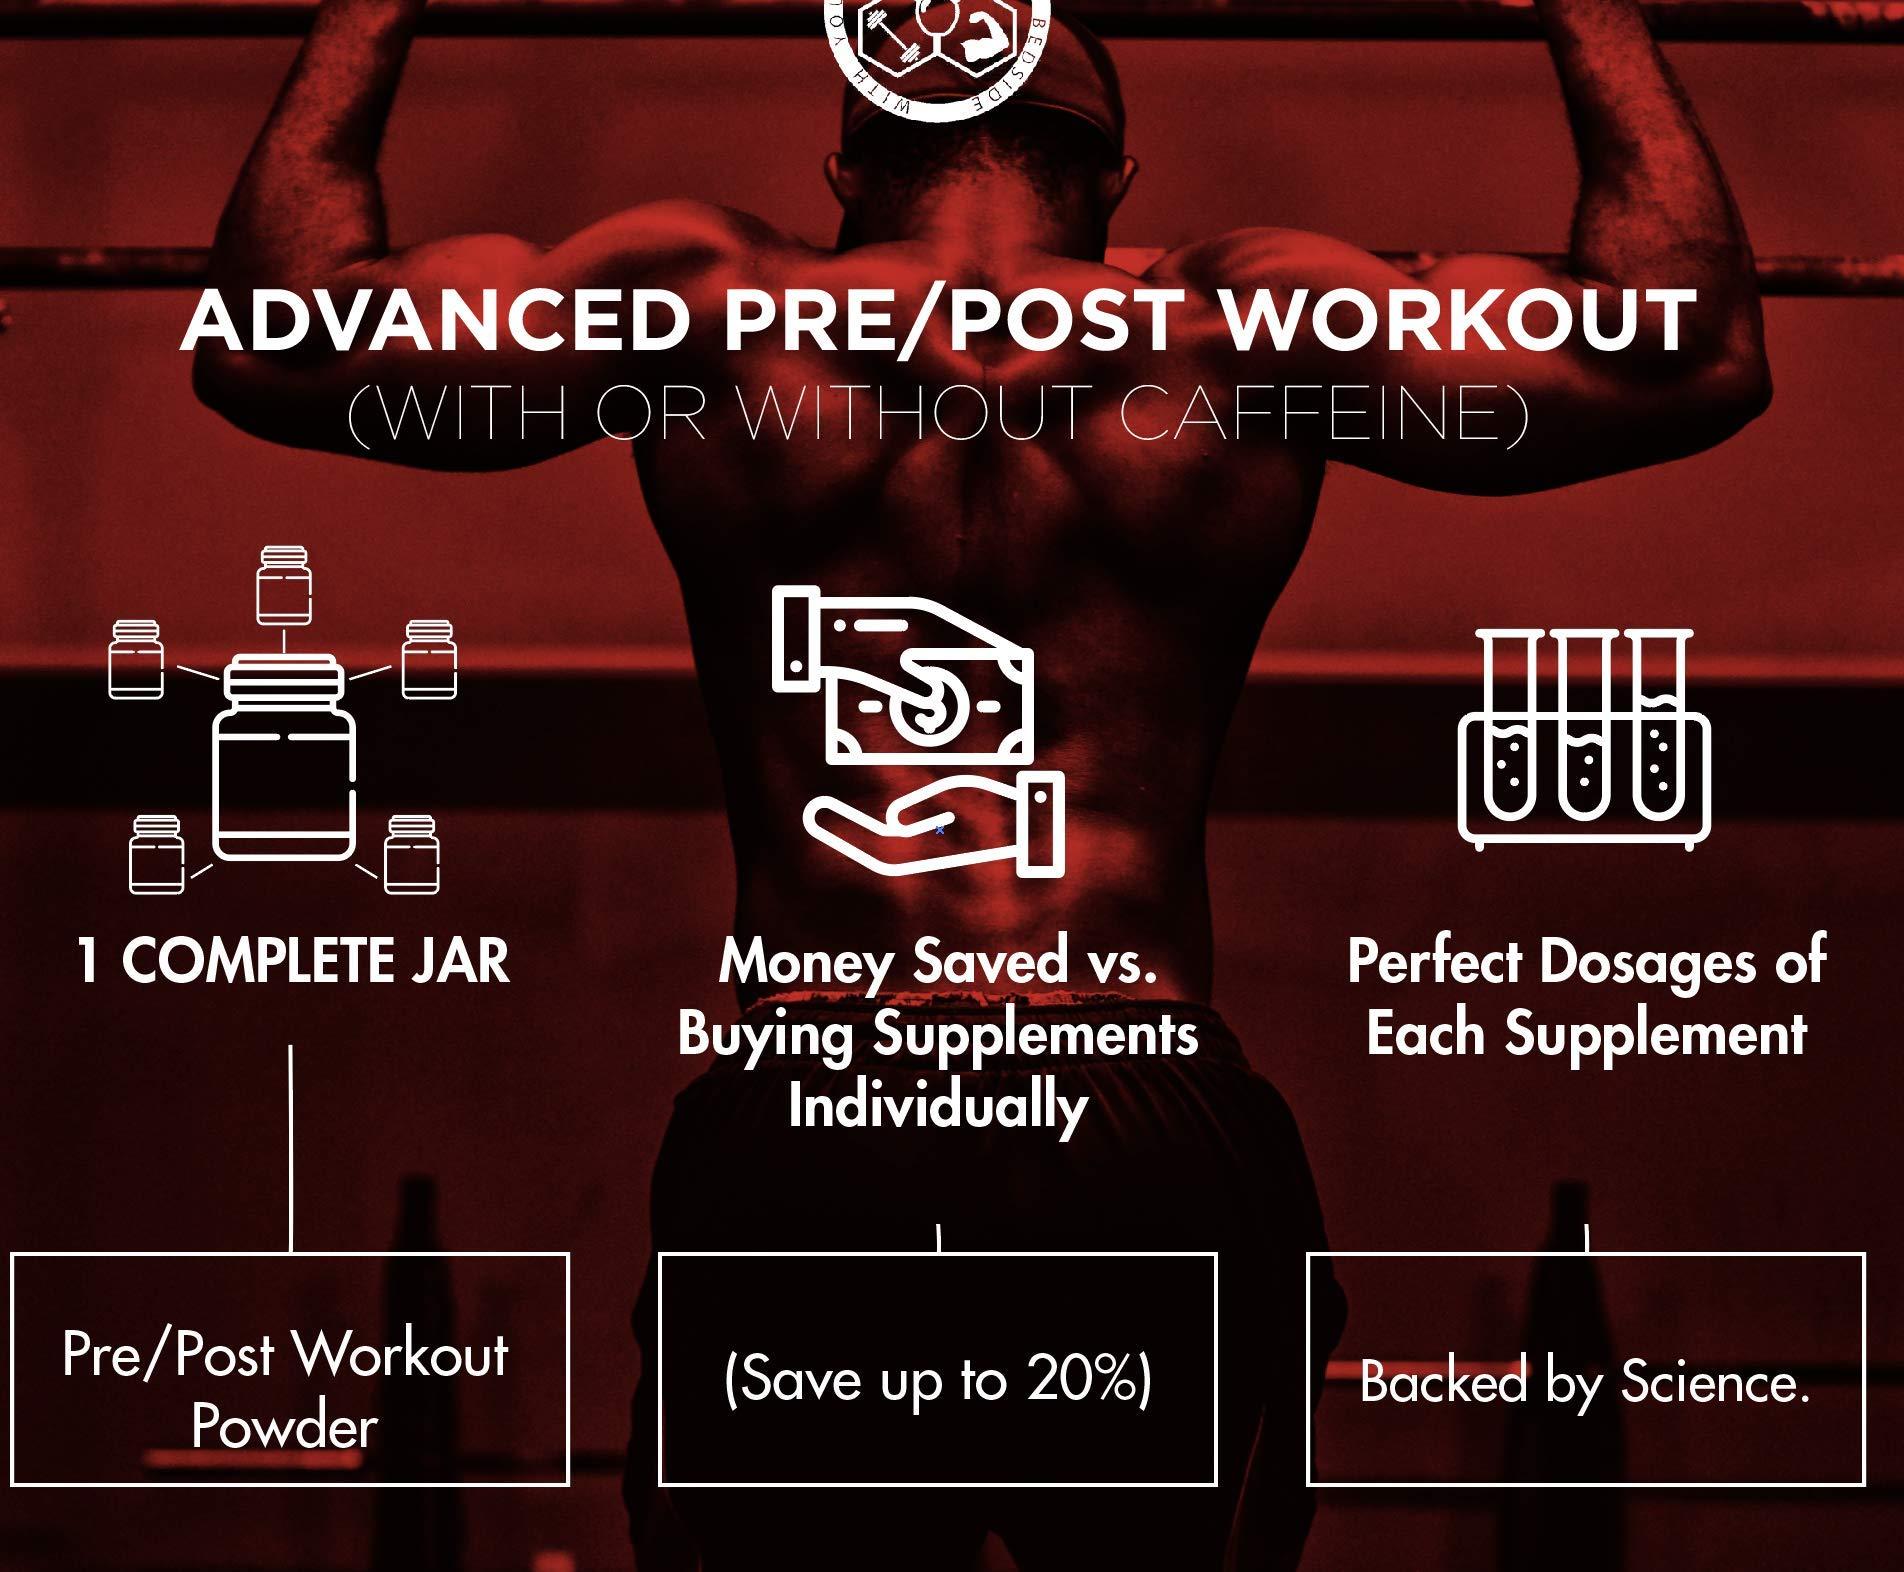 Barbell Medicine, Peri-Rx Post & Pre-Workout Powder, BCAA, Creatine Monohydrate, Beta Alanine, Citrulline Malate, HMB, Betaine Anhydrous, Caffeine Free, Watermelon, 687g by GainzZz Rx (Image #6)